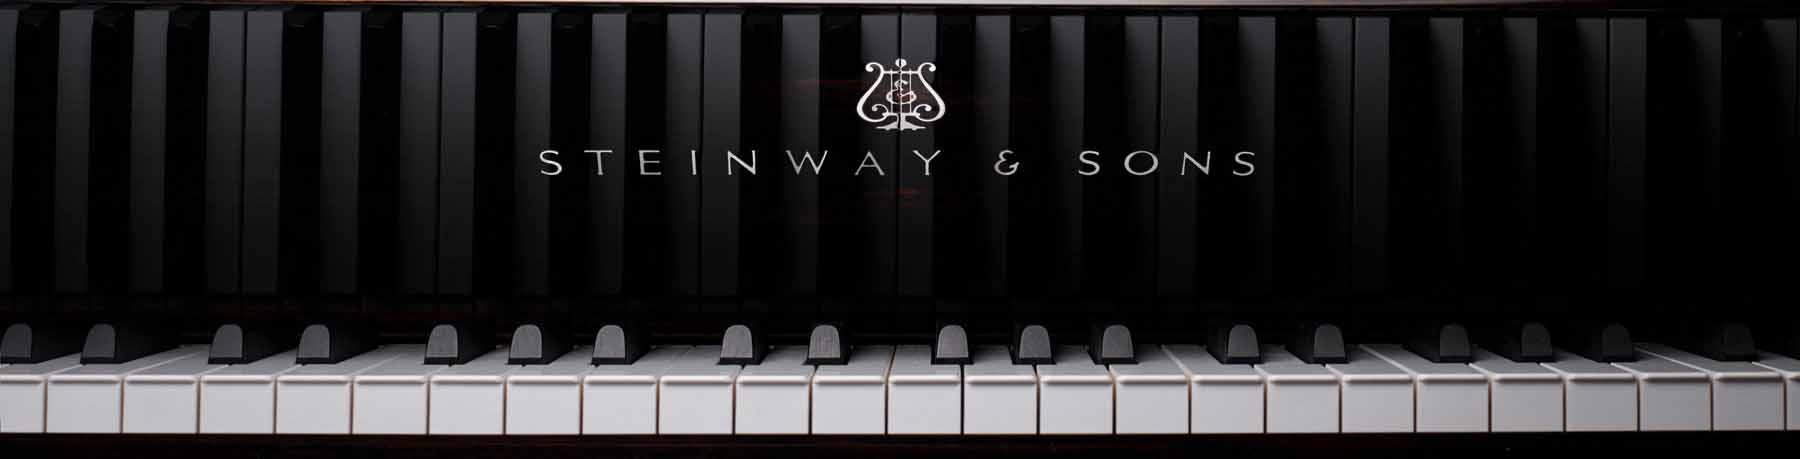 clavier de piano steinway